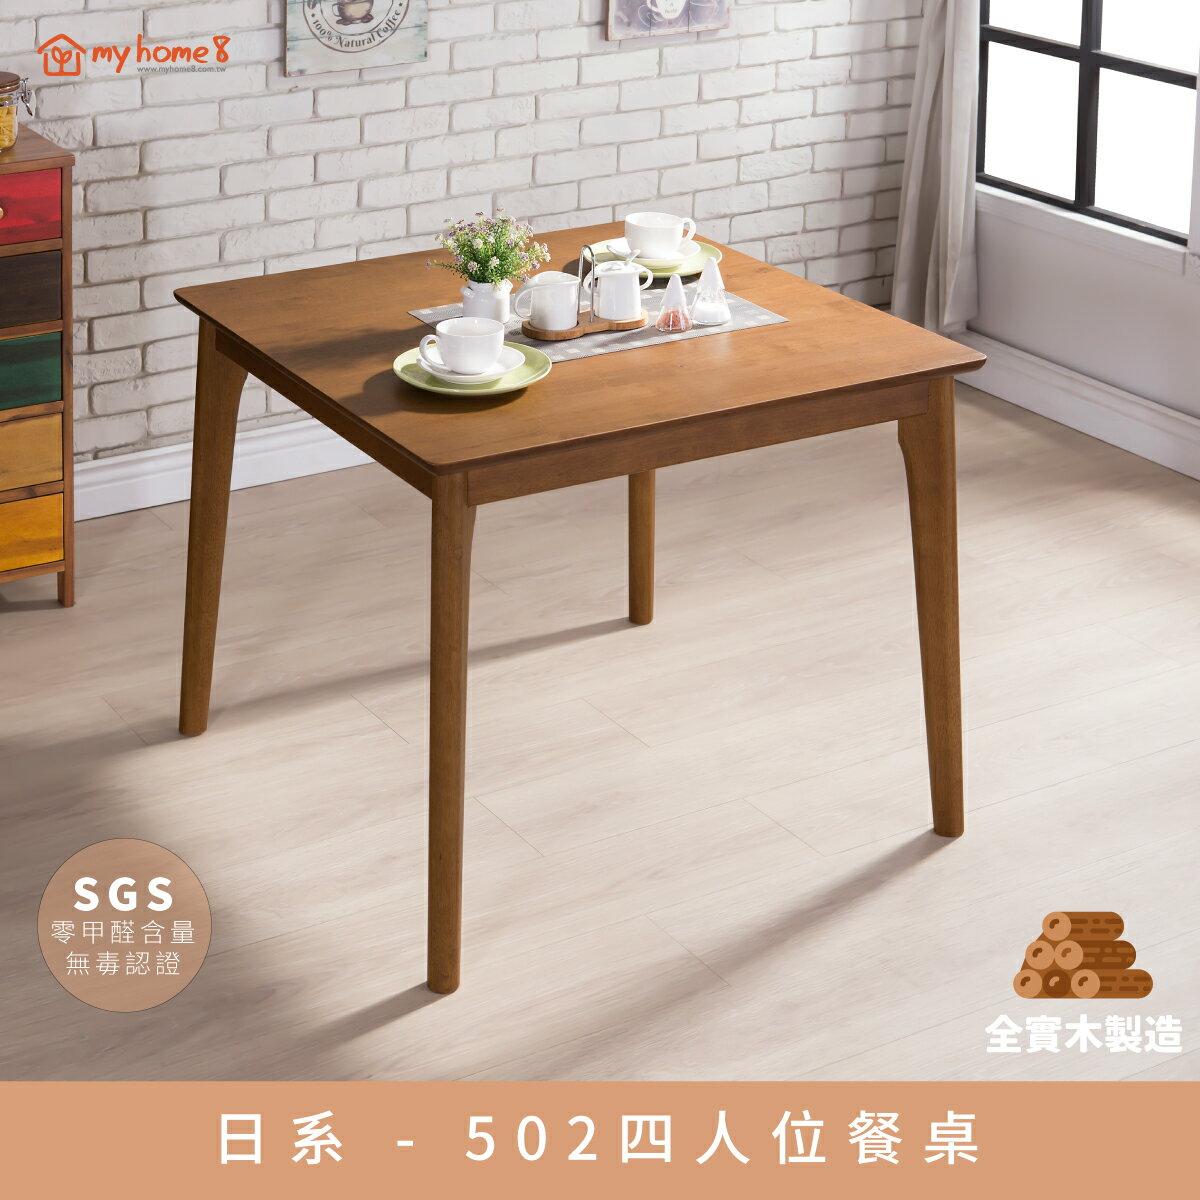 【myhome8居家無限】日系全實木四人位餐桌 淺胡桃色